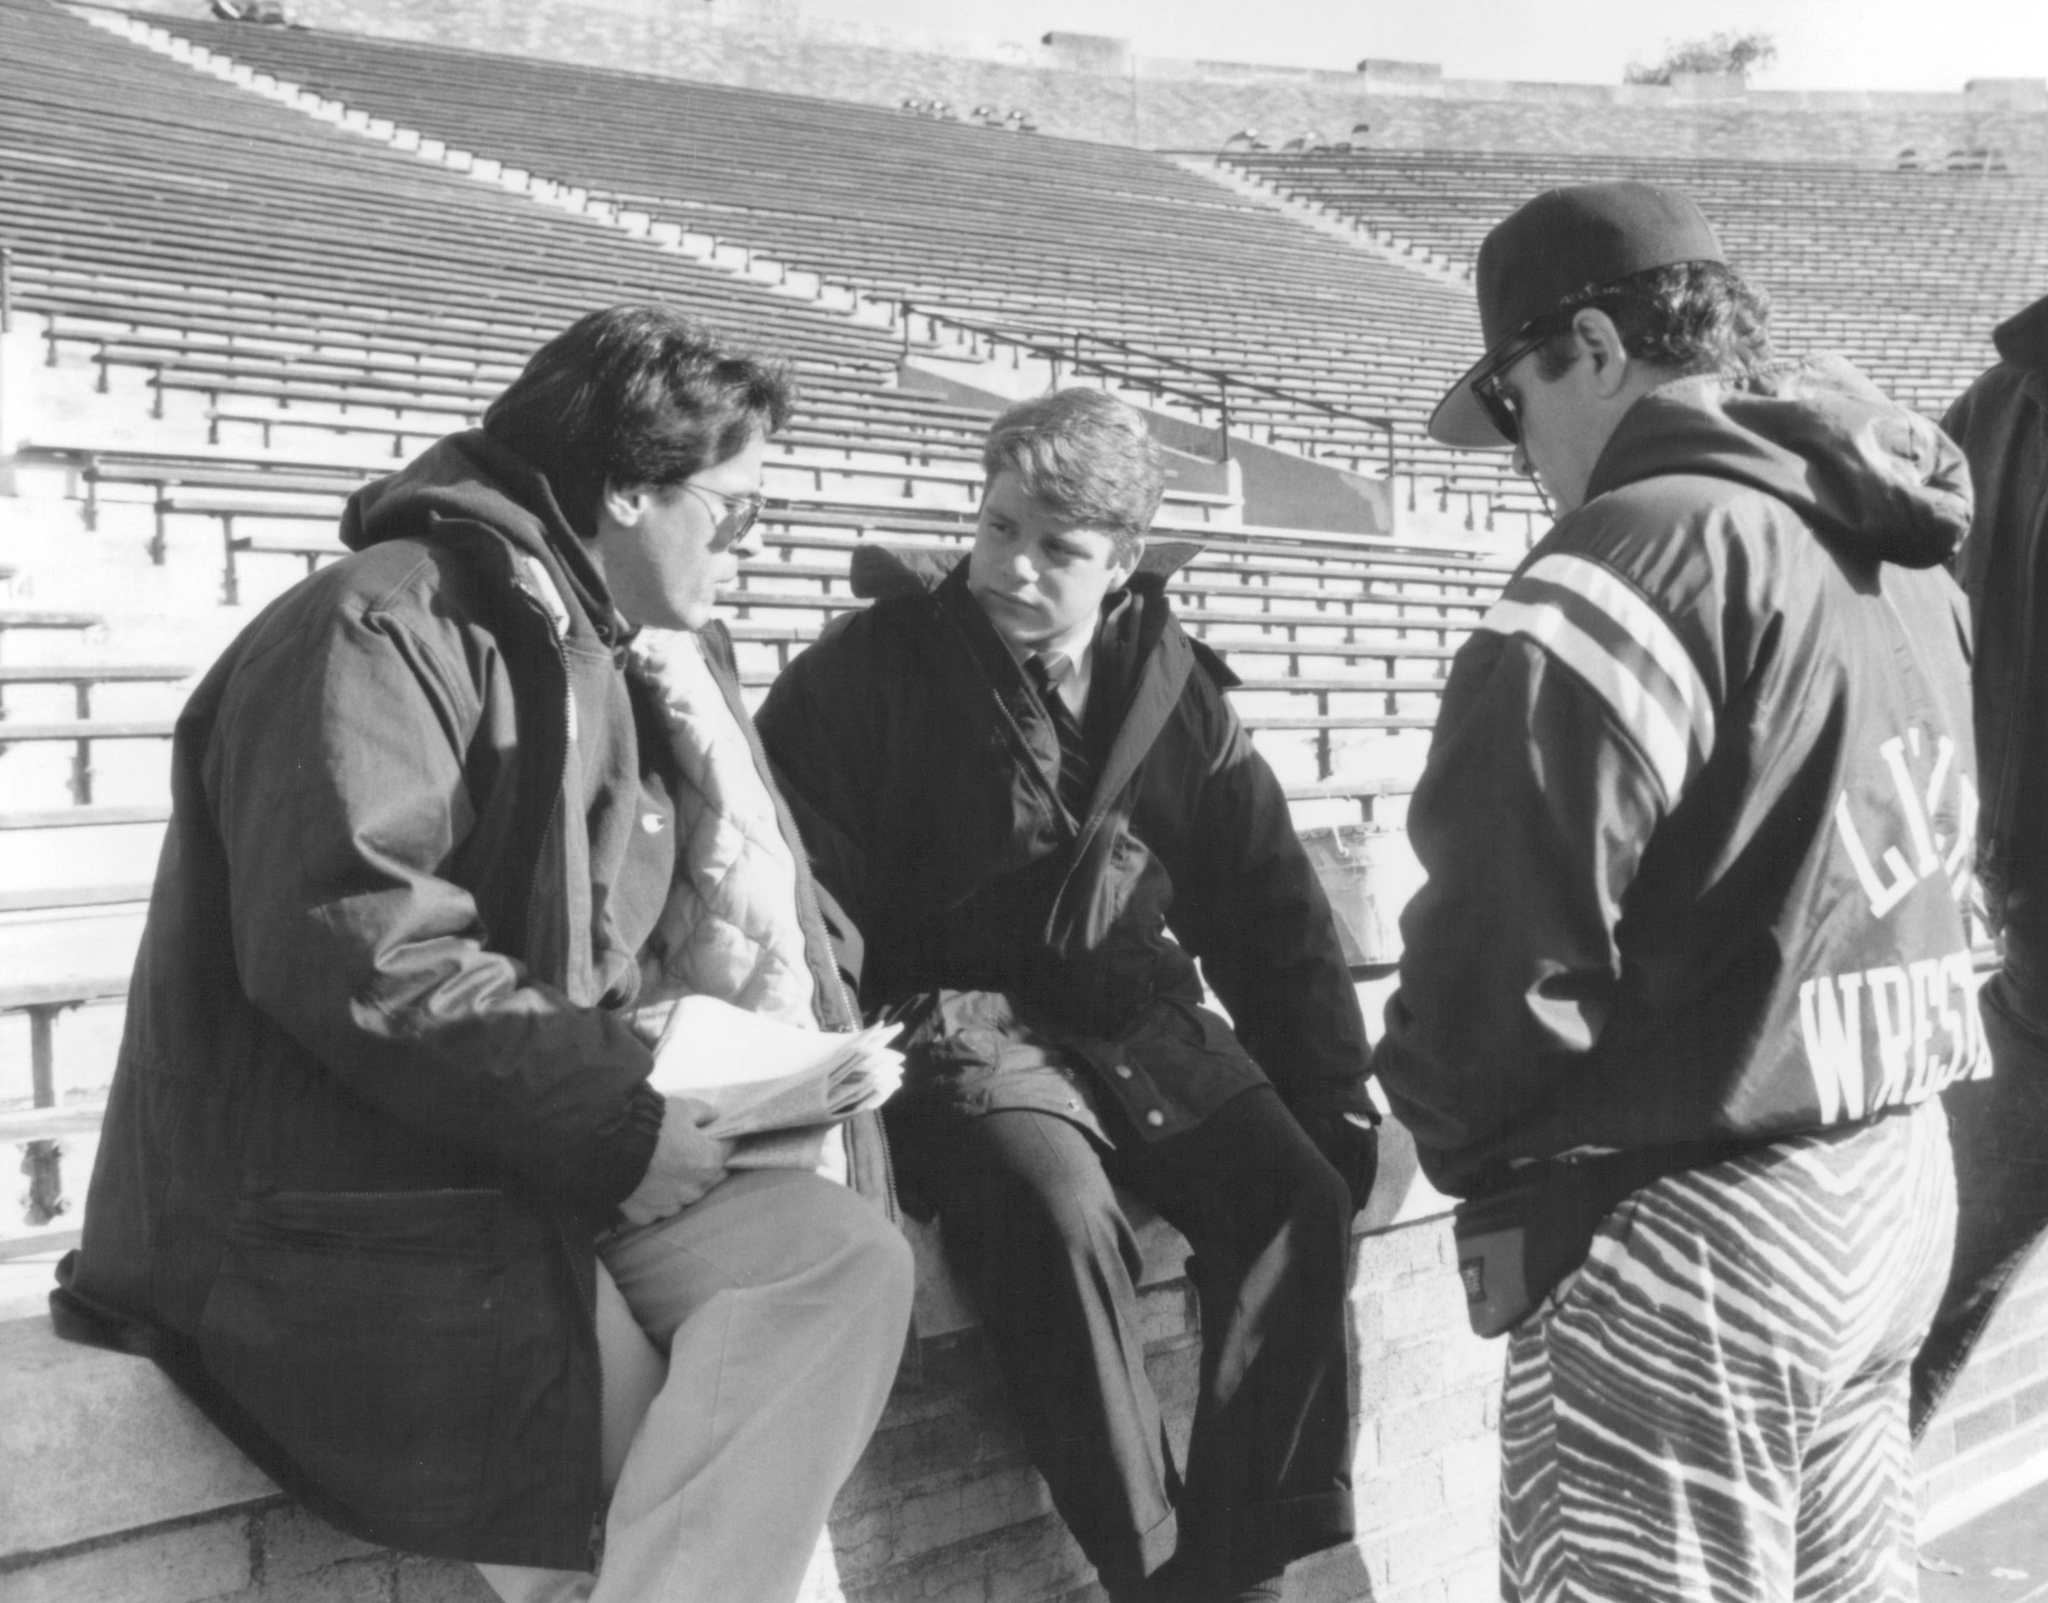 Sean Astin and David Anspaugh in Rudy (1993)